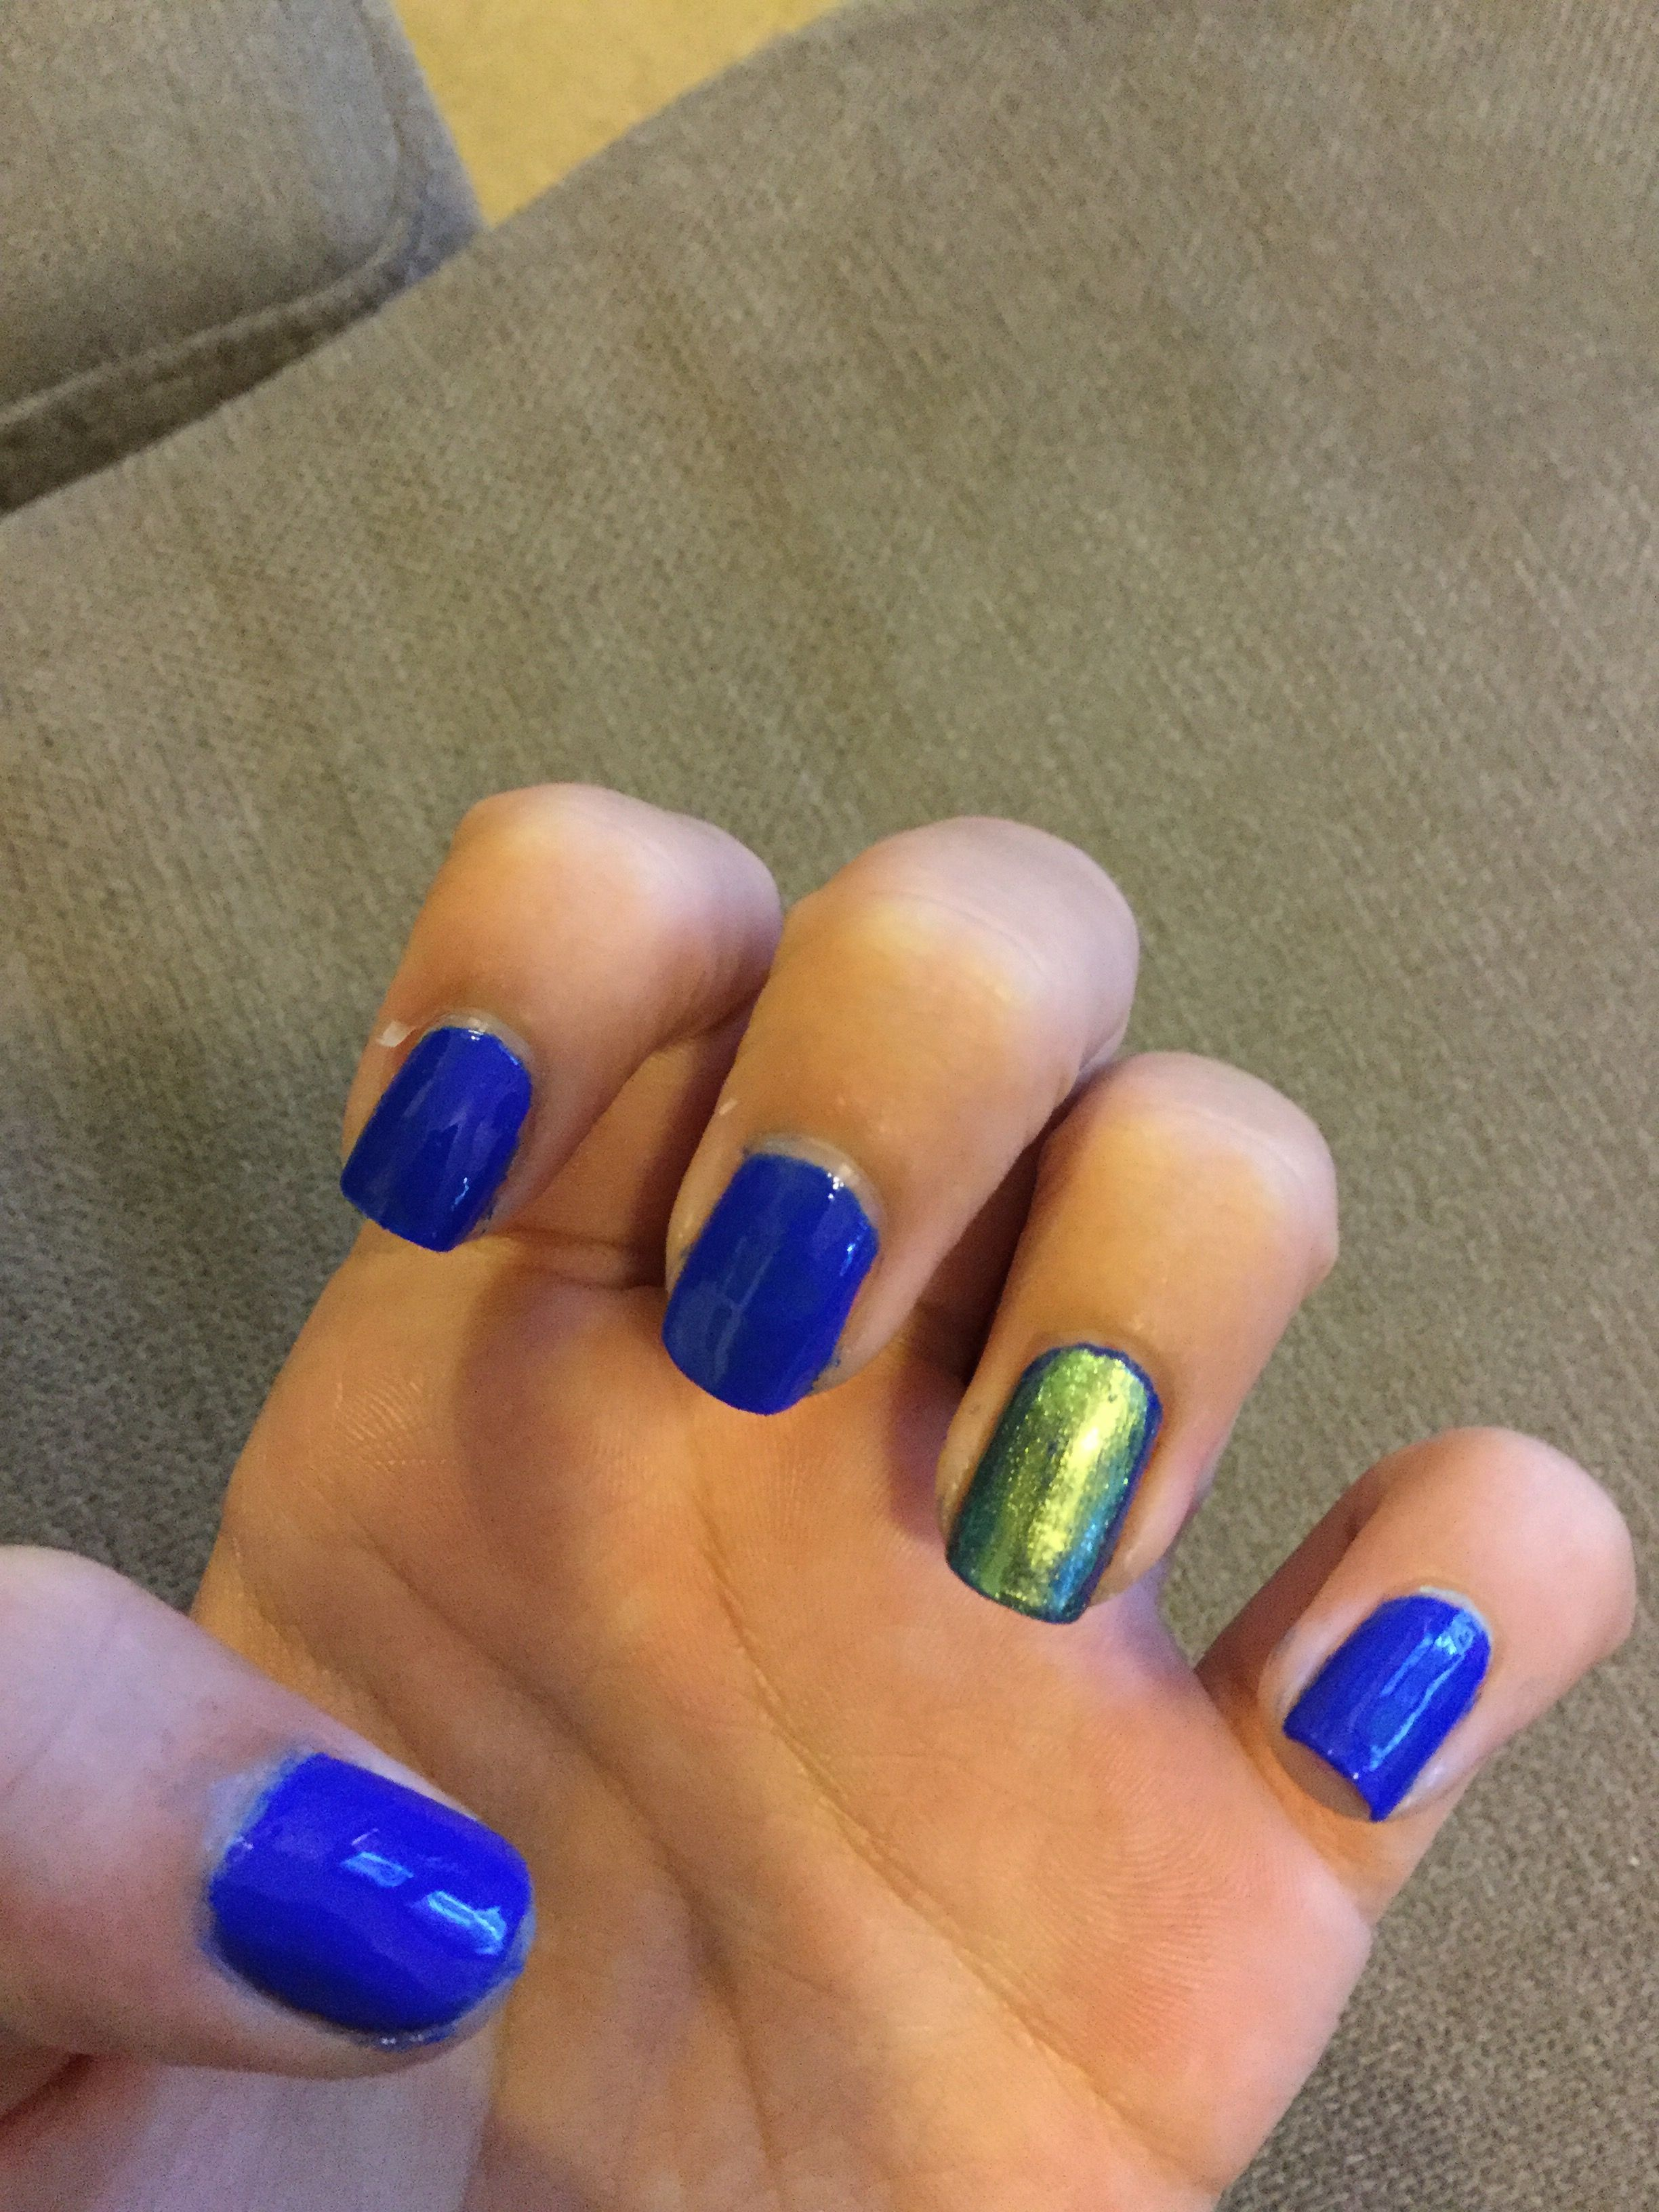 Nails dark blue and Kyle Jenner metallic 😝😘